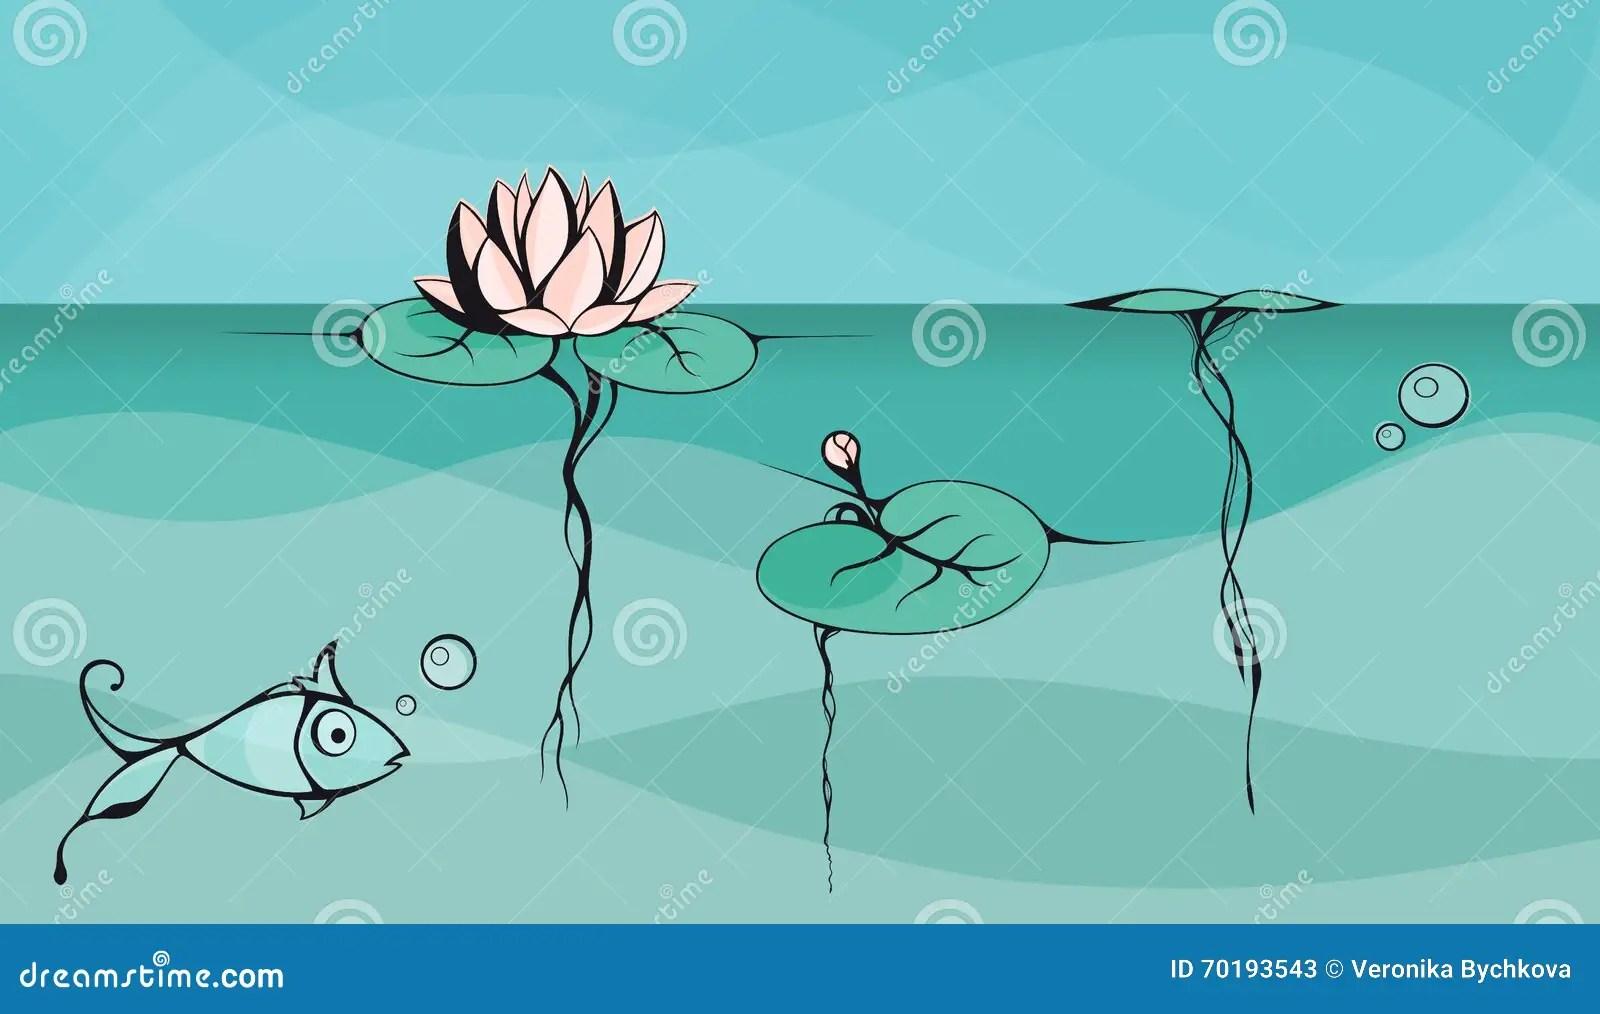 lotus in water plant diagram caravan wiring diagrams 12 volt outline vector drawing of floating on the lake